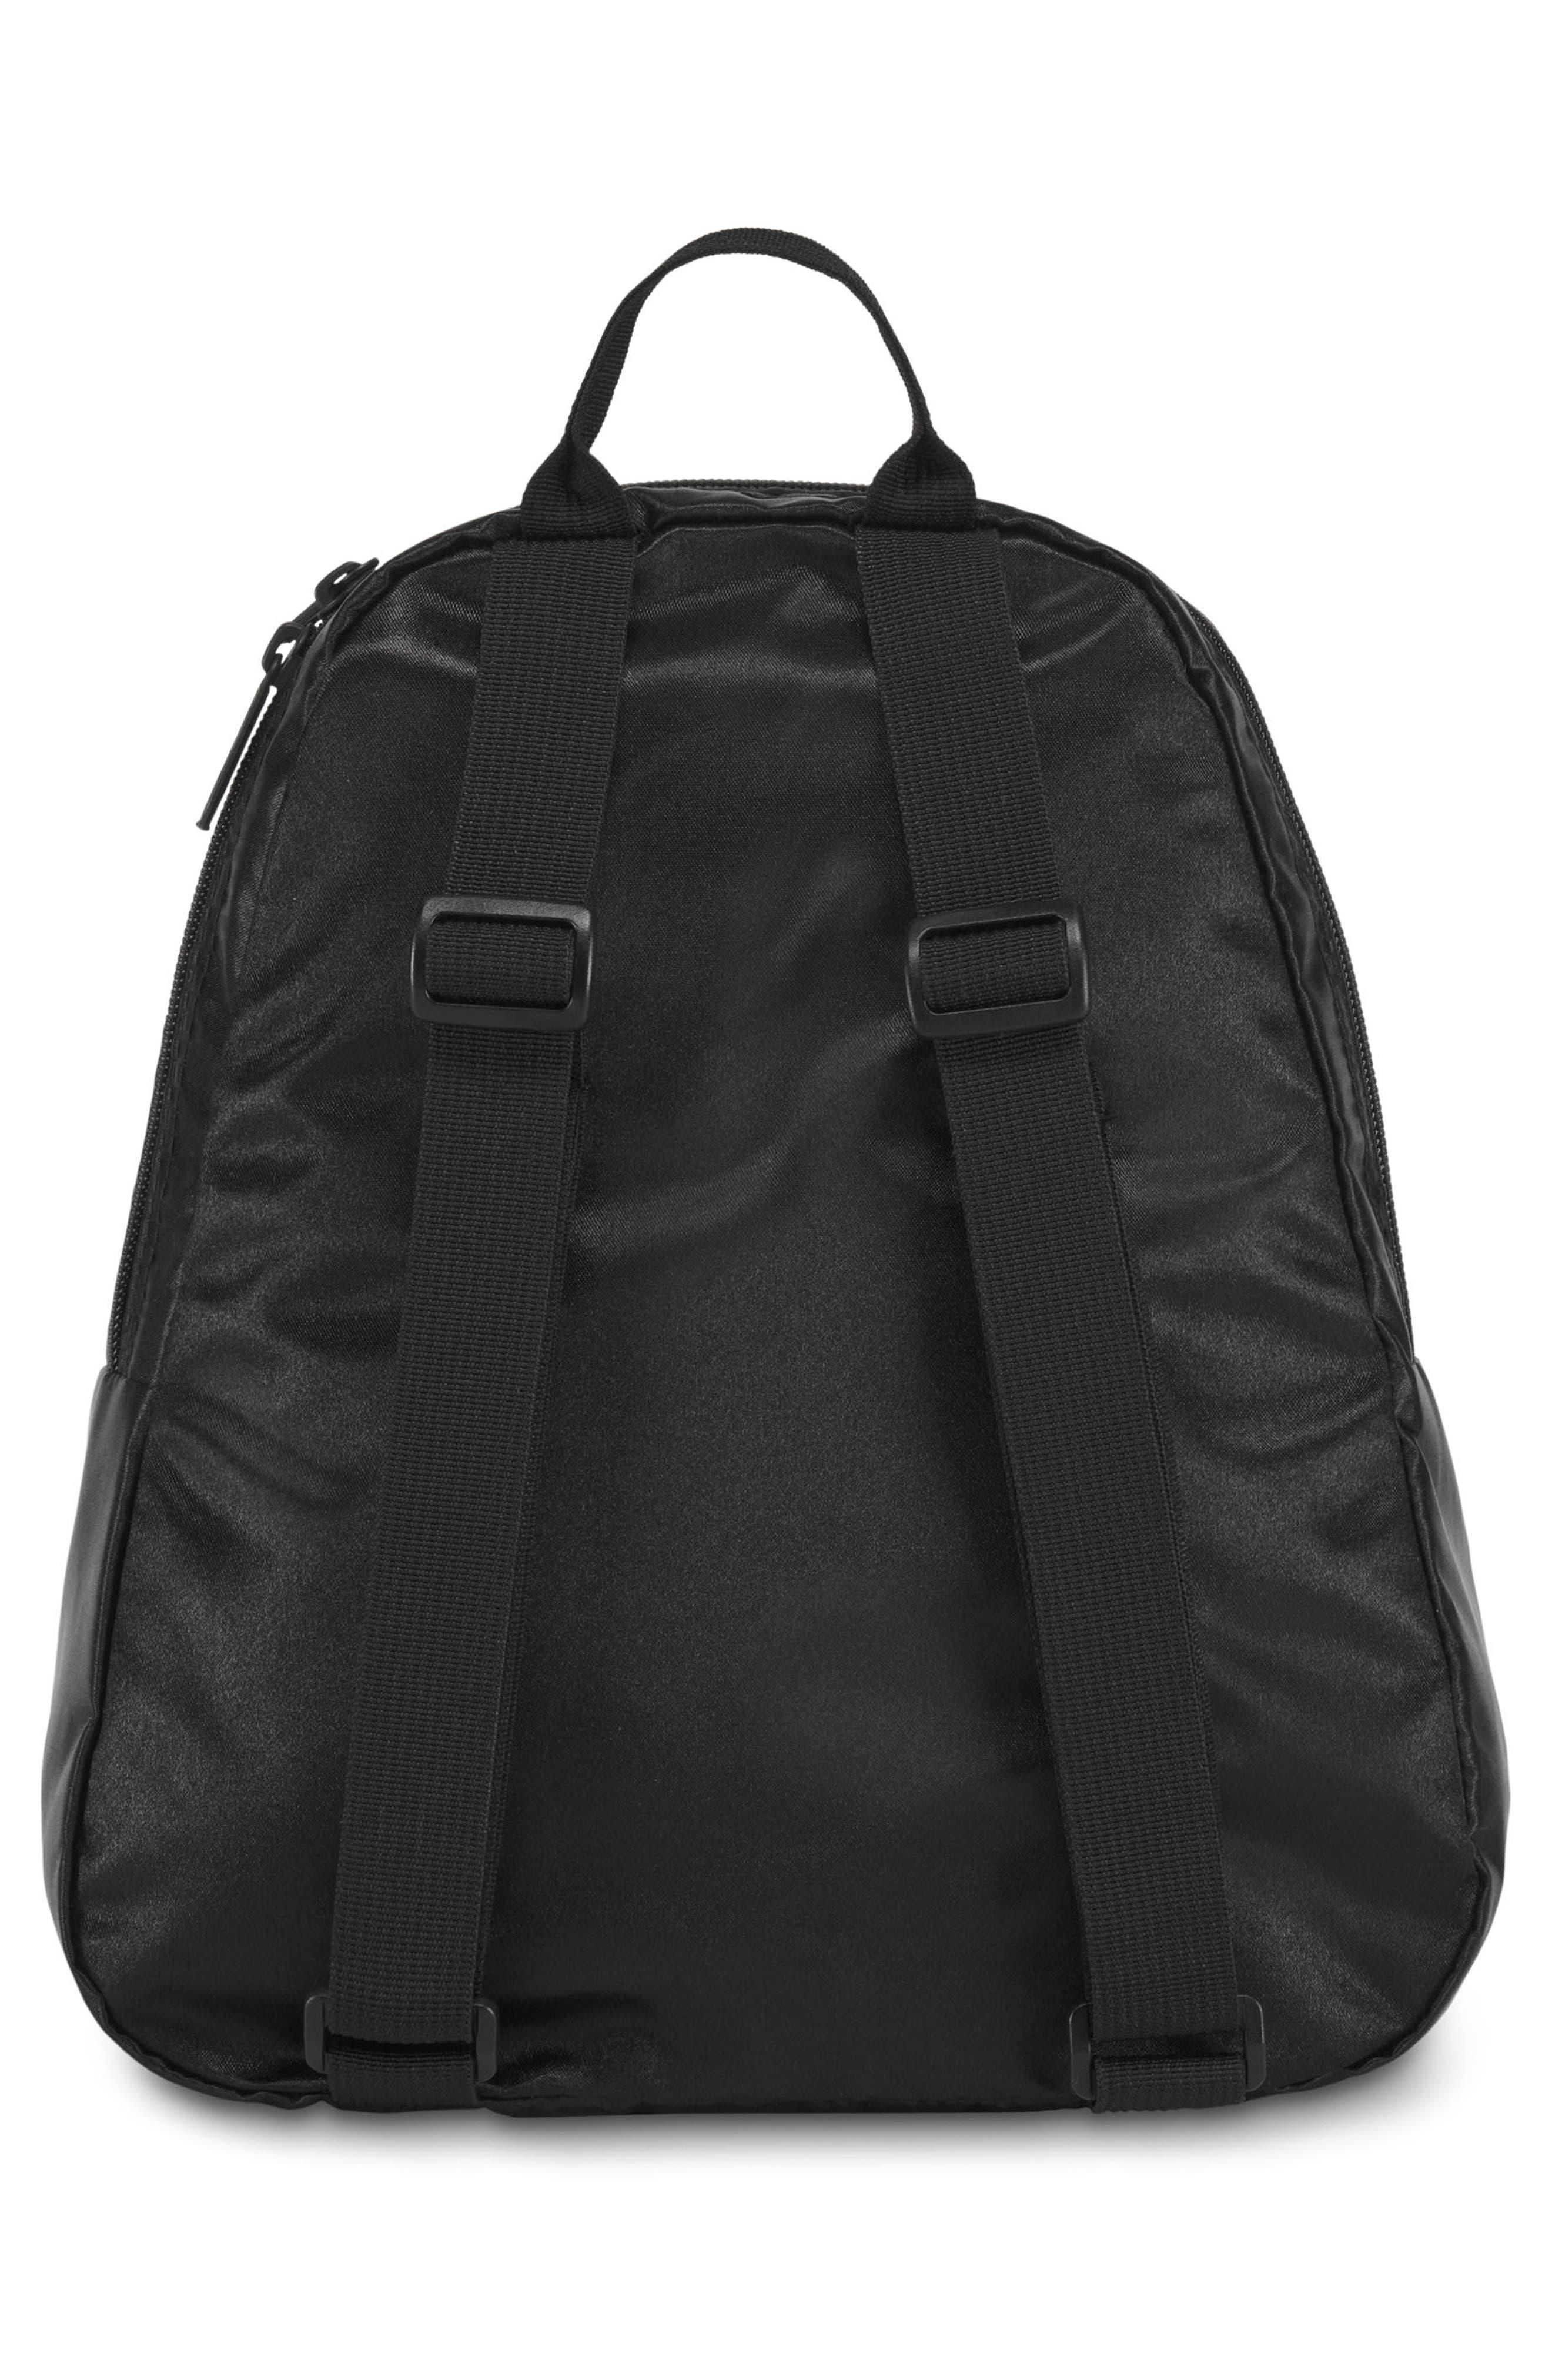 Half Pint FX Backpack,                             Alternate thumbnail 2, color,                             SATIN ROSE